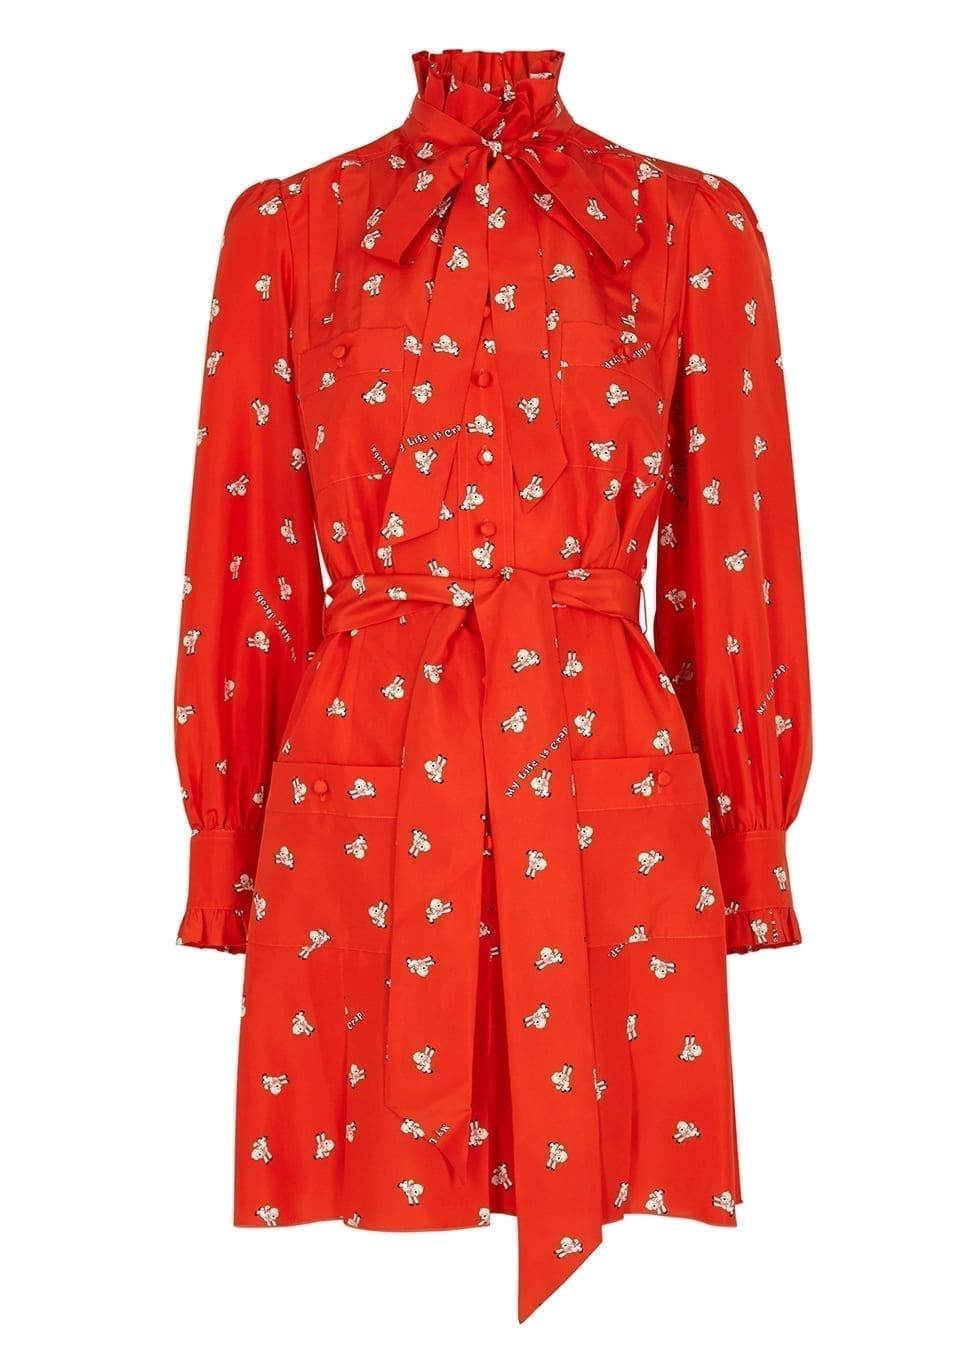 MARC JACOBS X Magda Archer Printed Silk Shirt Dress